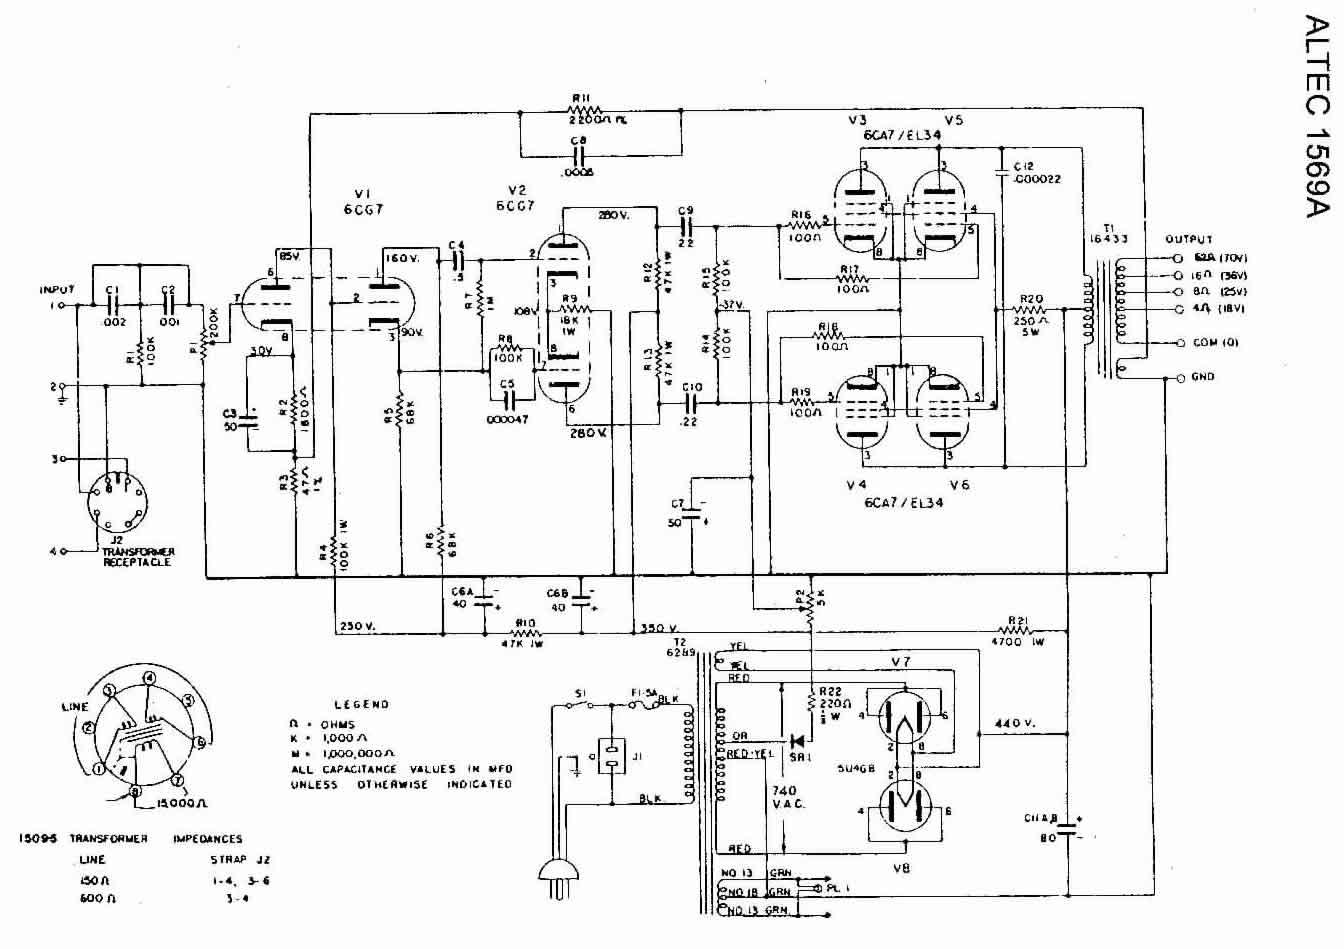 Altec Bucket Wiring Diagram | Online Wiring Diagram on